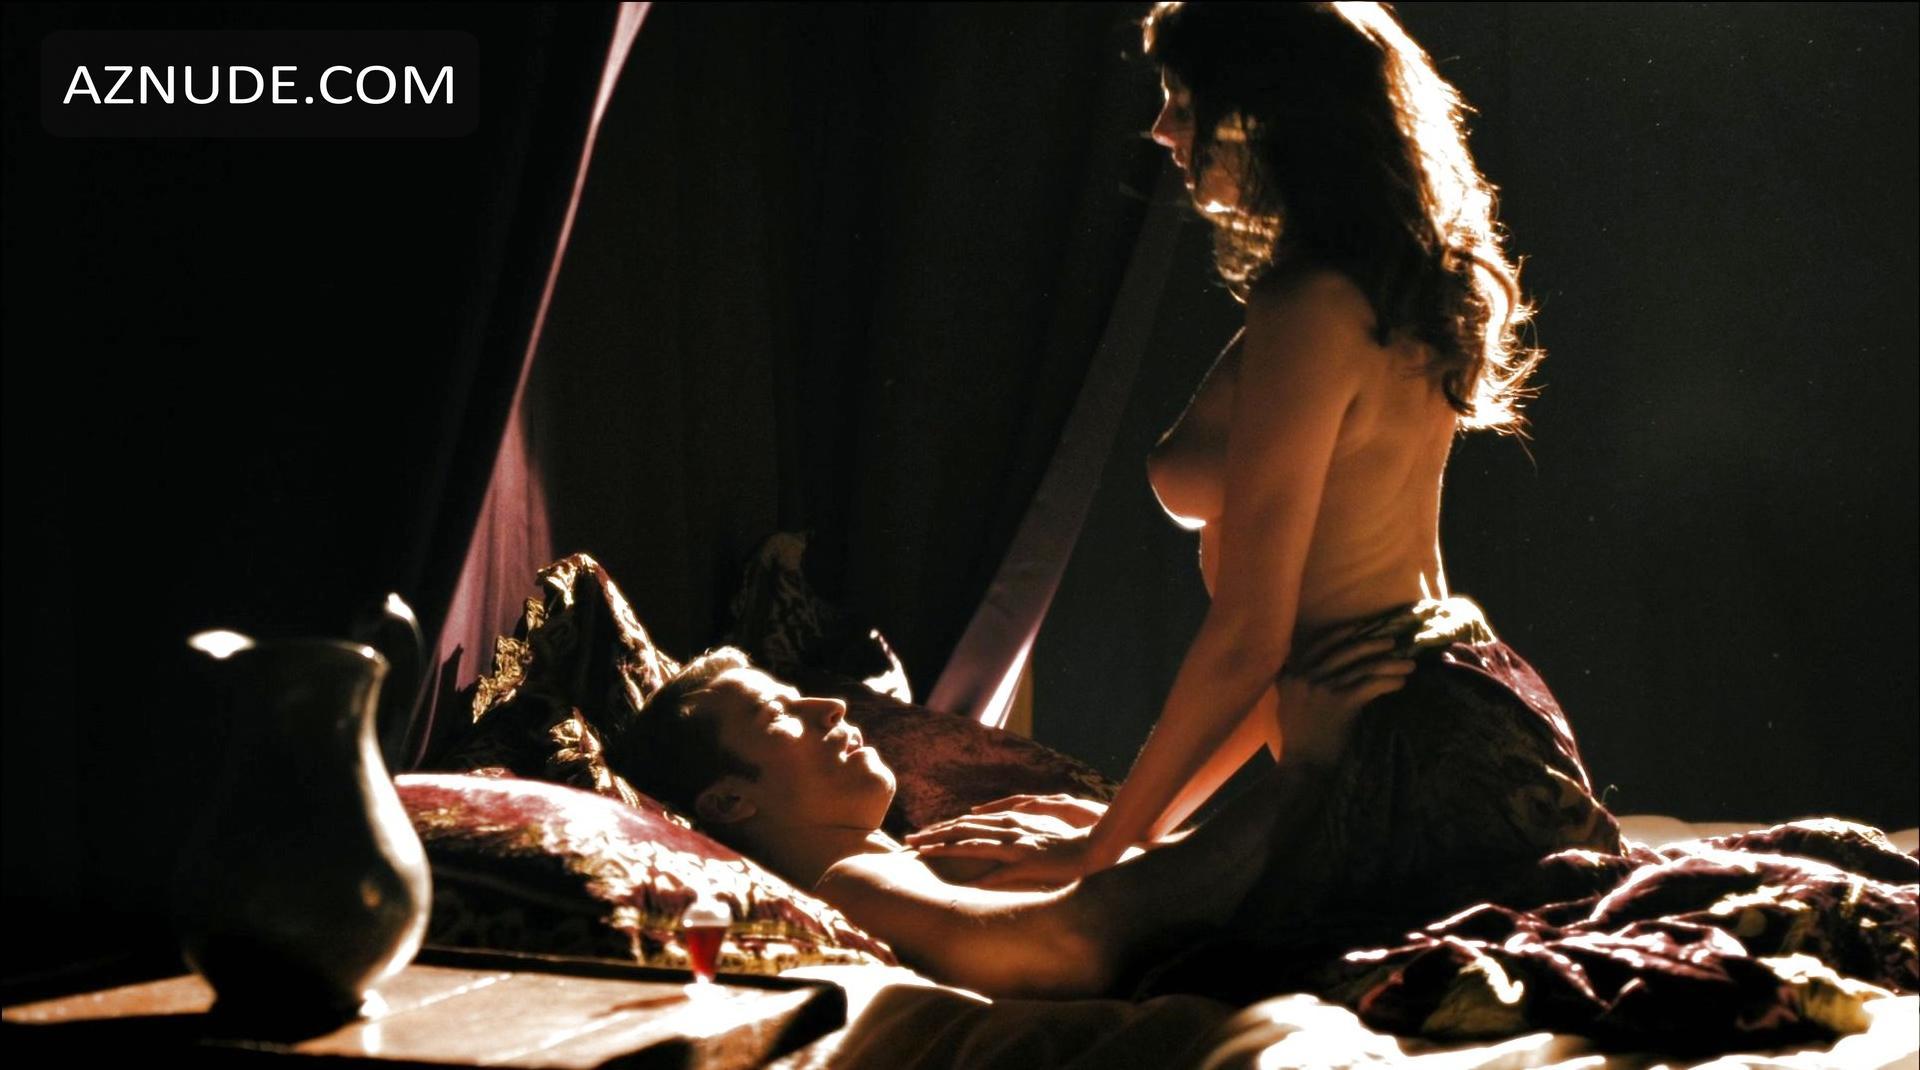 Kelly brook topless sex in survival island scandalplanetcom - 2 part 1